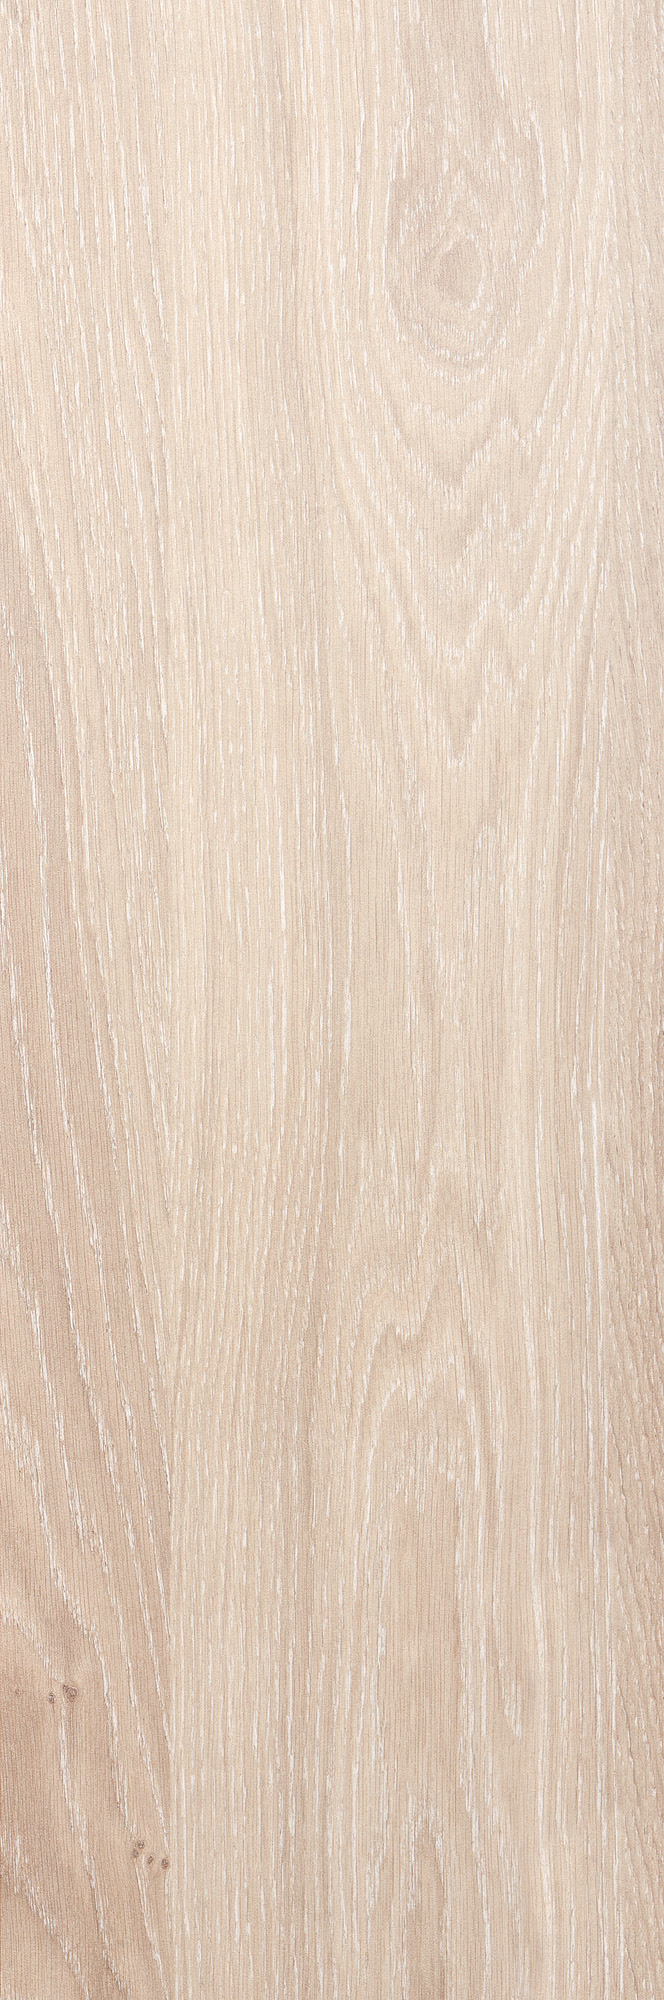 Chêne blanc brossé